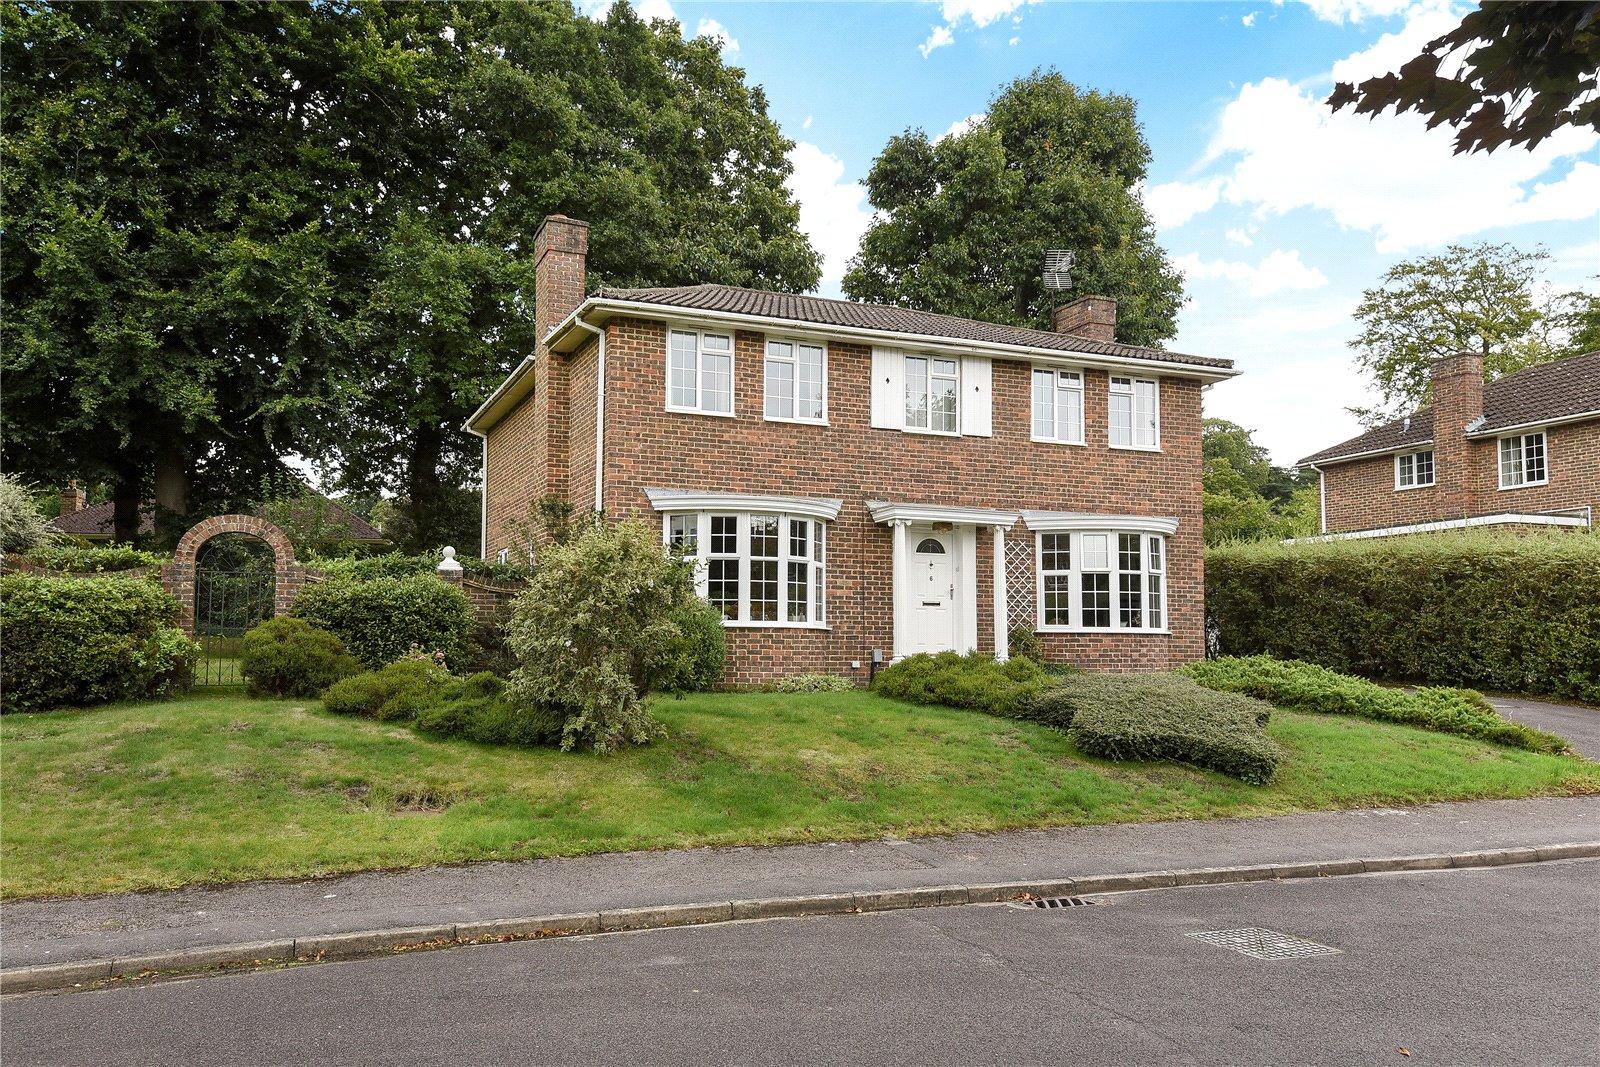 5 Bedrooms Detached House for sale in Amberwood Drive, Camberley, Surrey, GU15